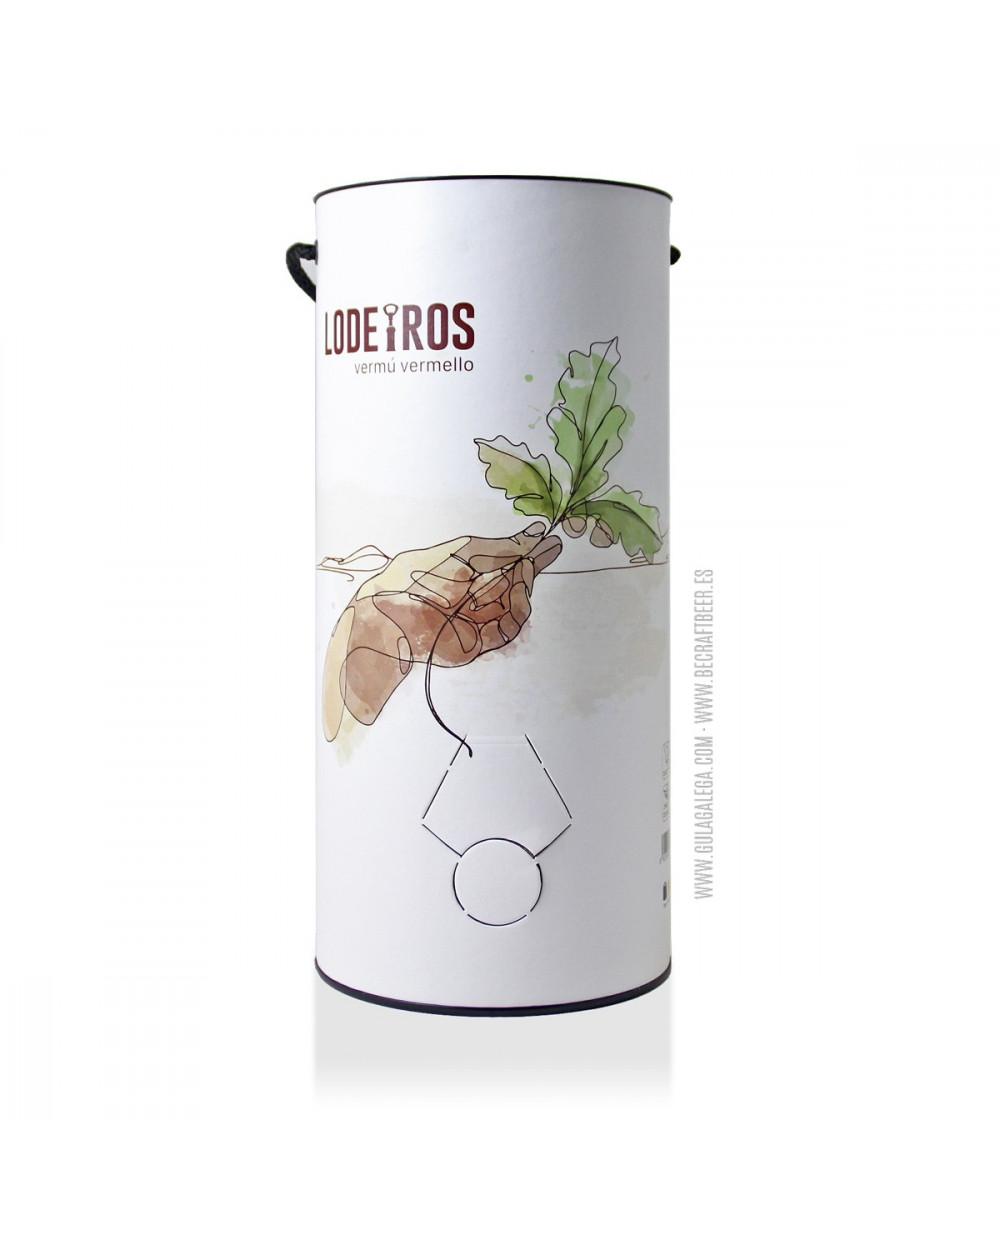 Vermut Rojo LODEIROS 5 litros (Recambio barrilete)